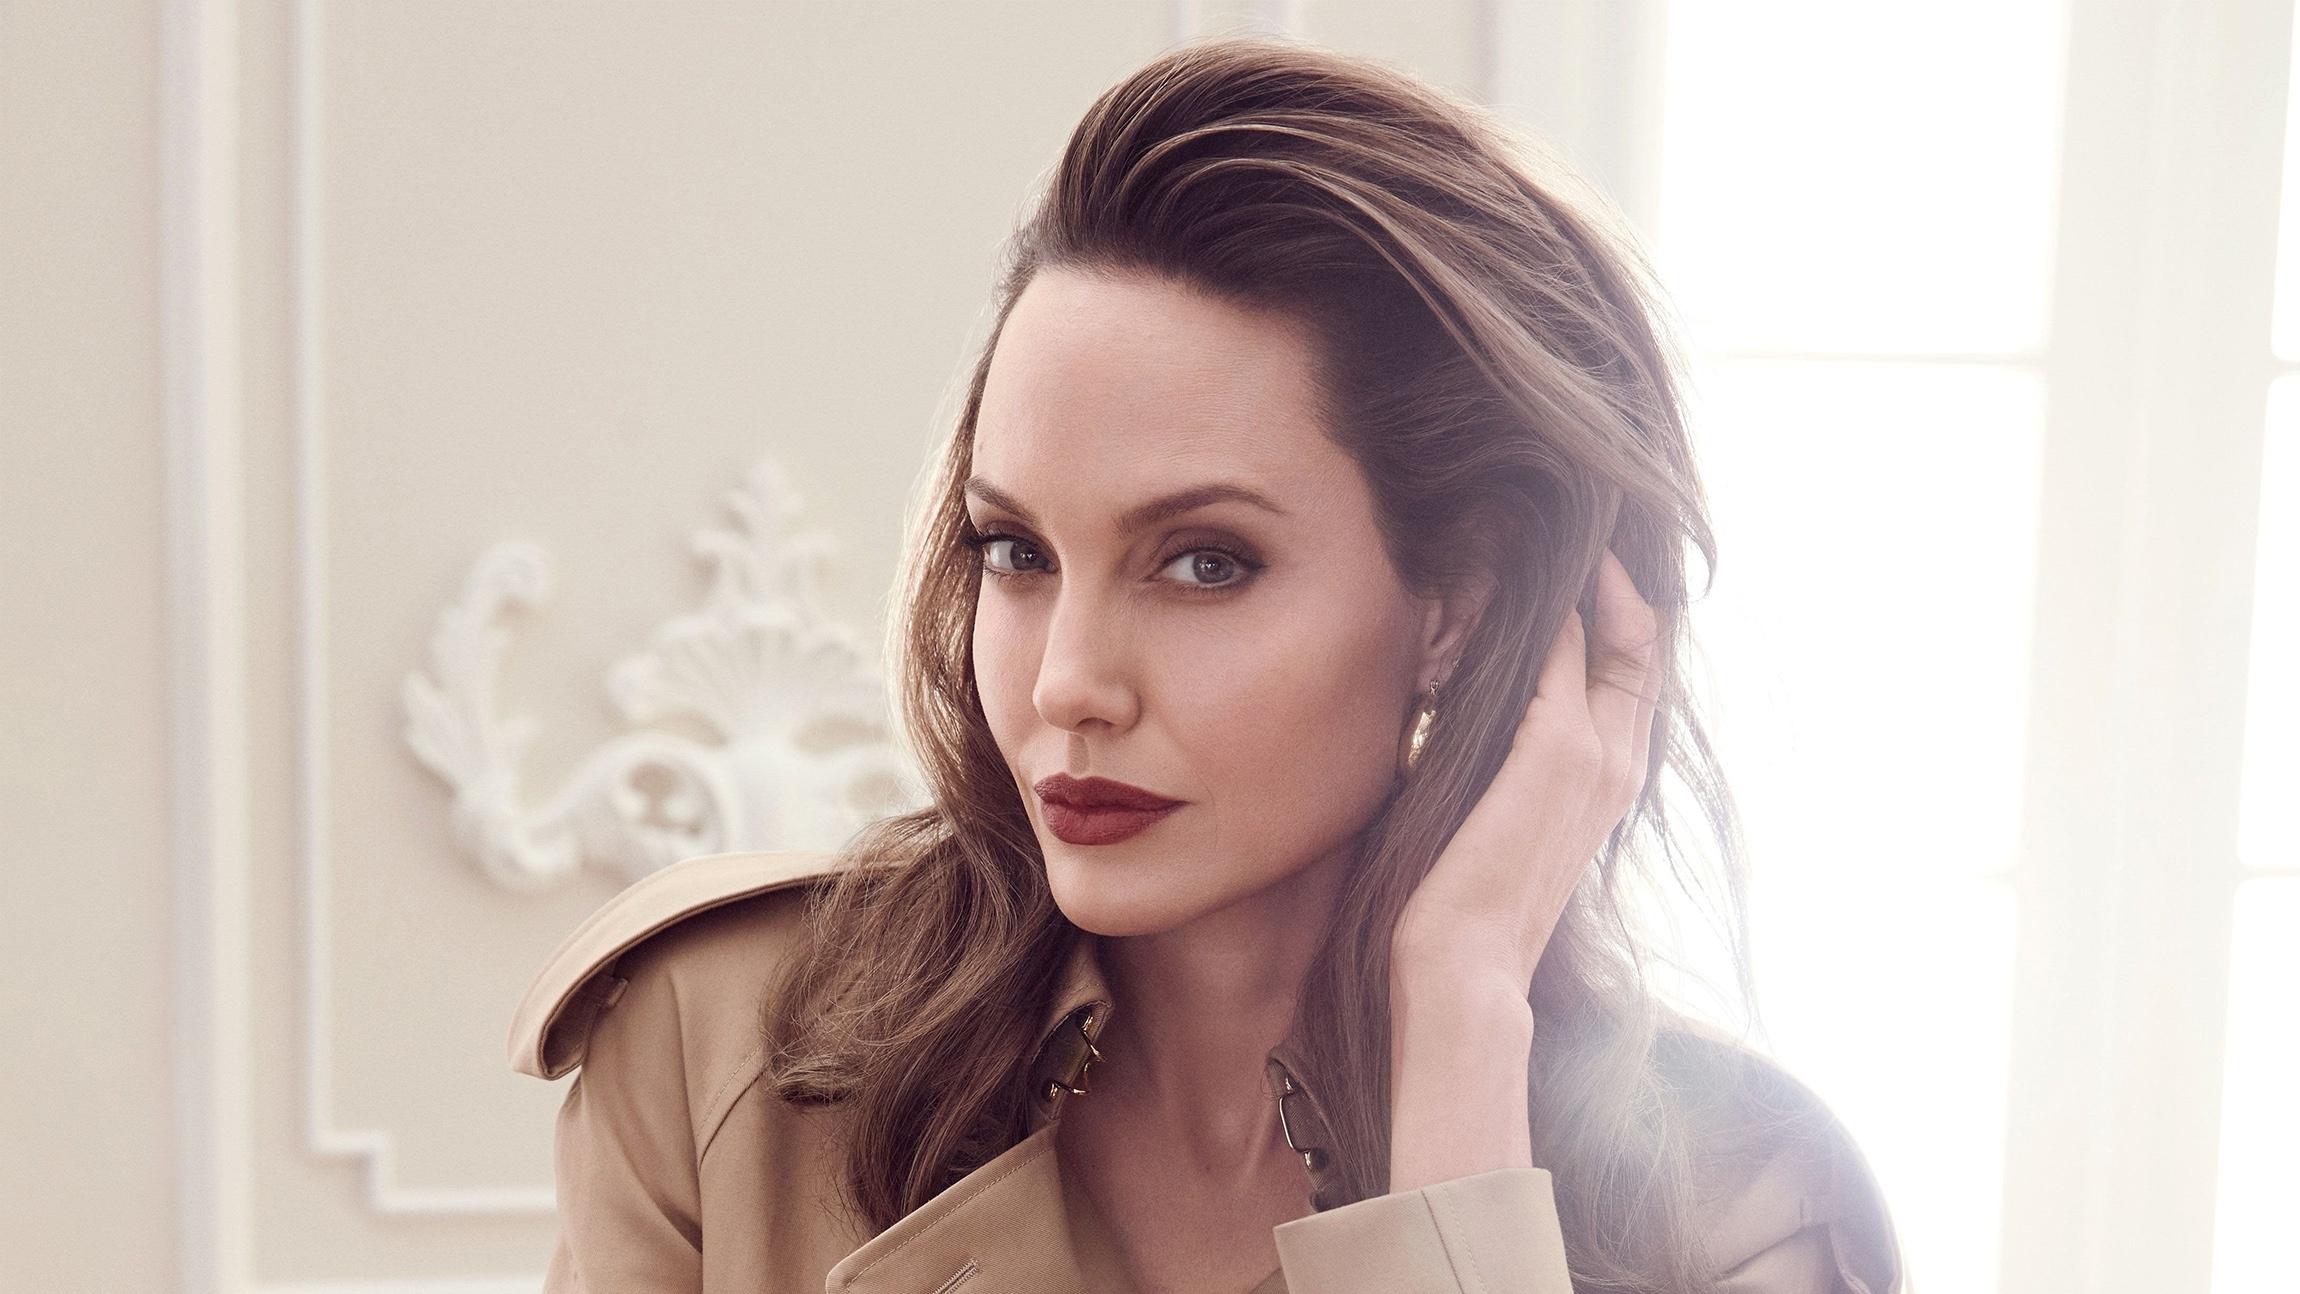 Angelina Jolie Wallpapers #1:Togog Dolanan Blog